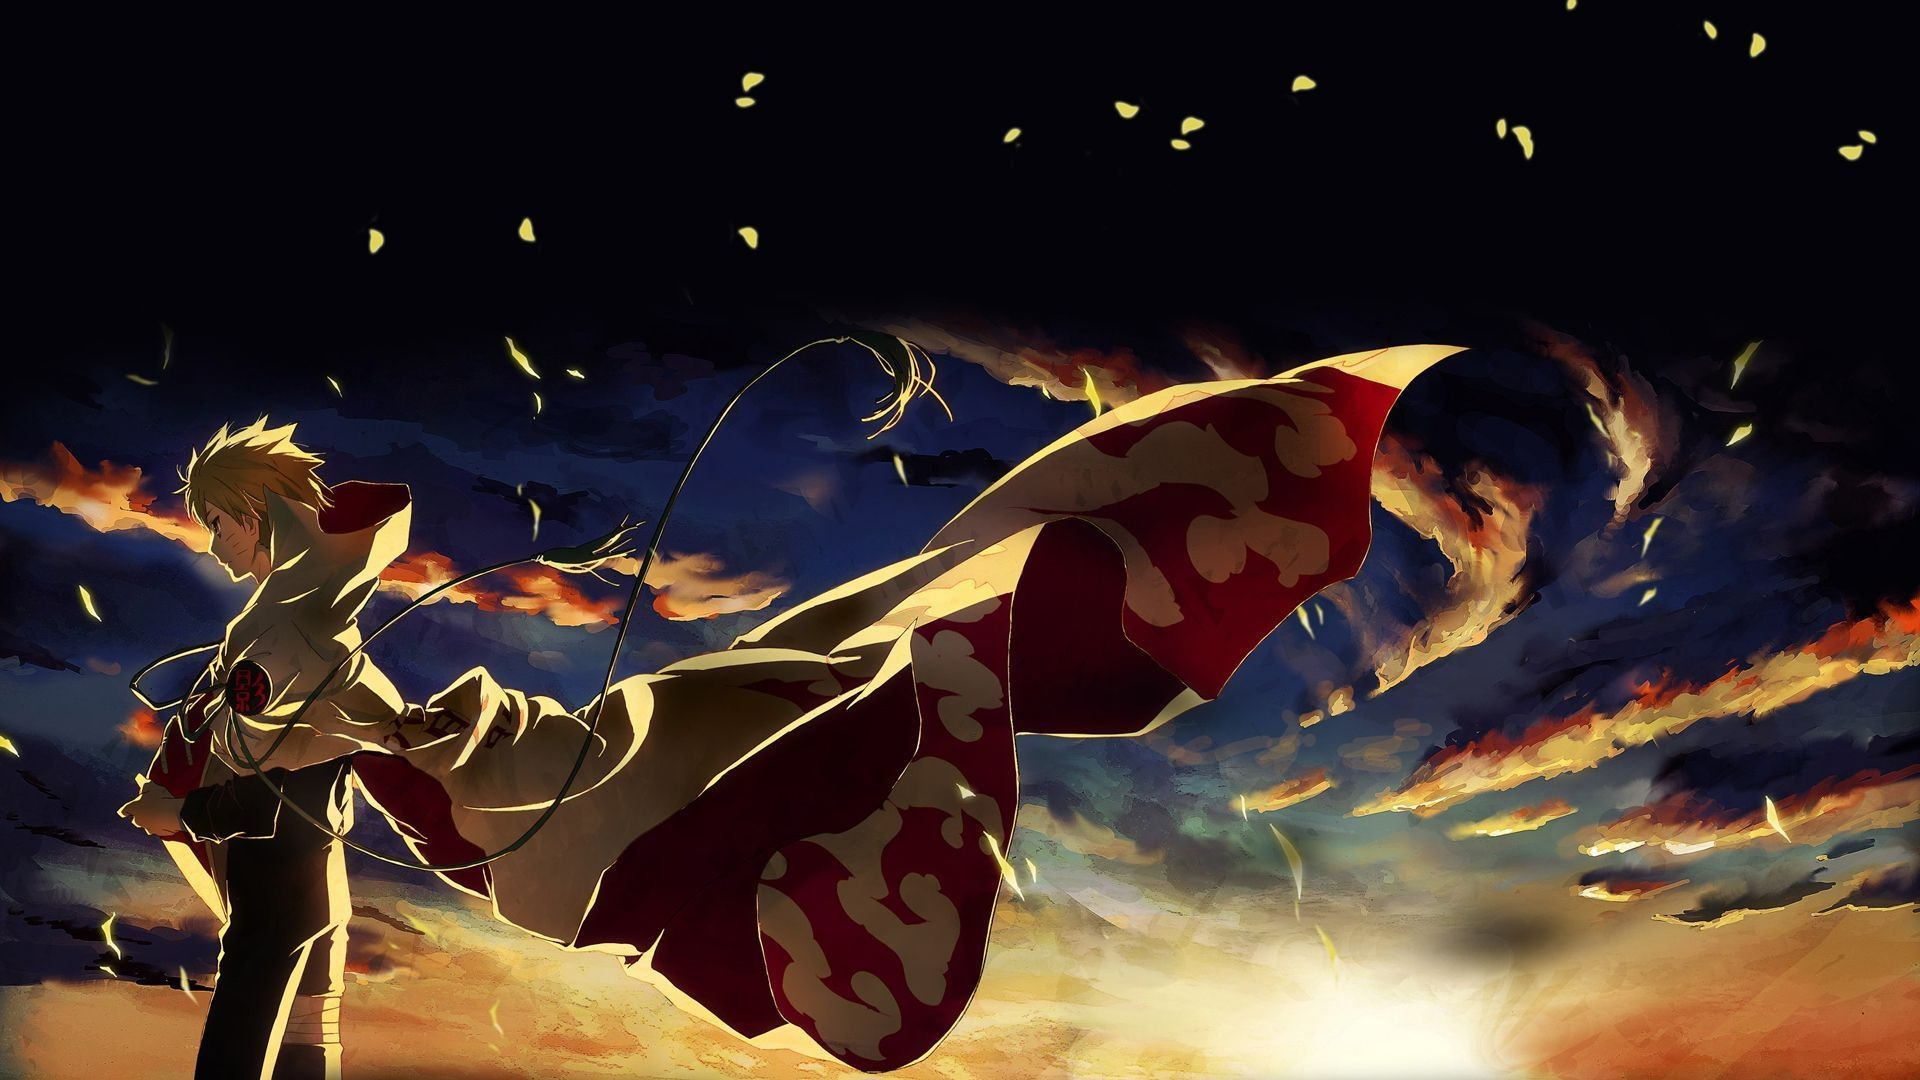 naruto-anime-picture-hd-wallpaper-1920×1080-1080p.jpg